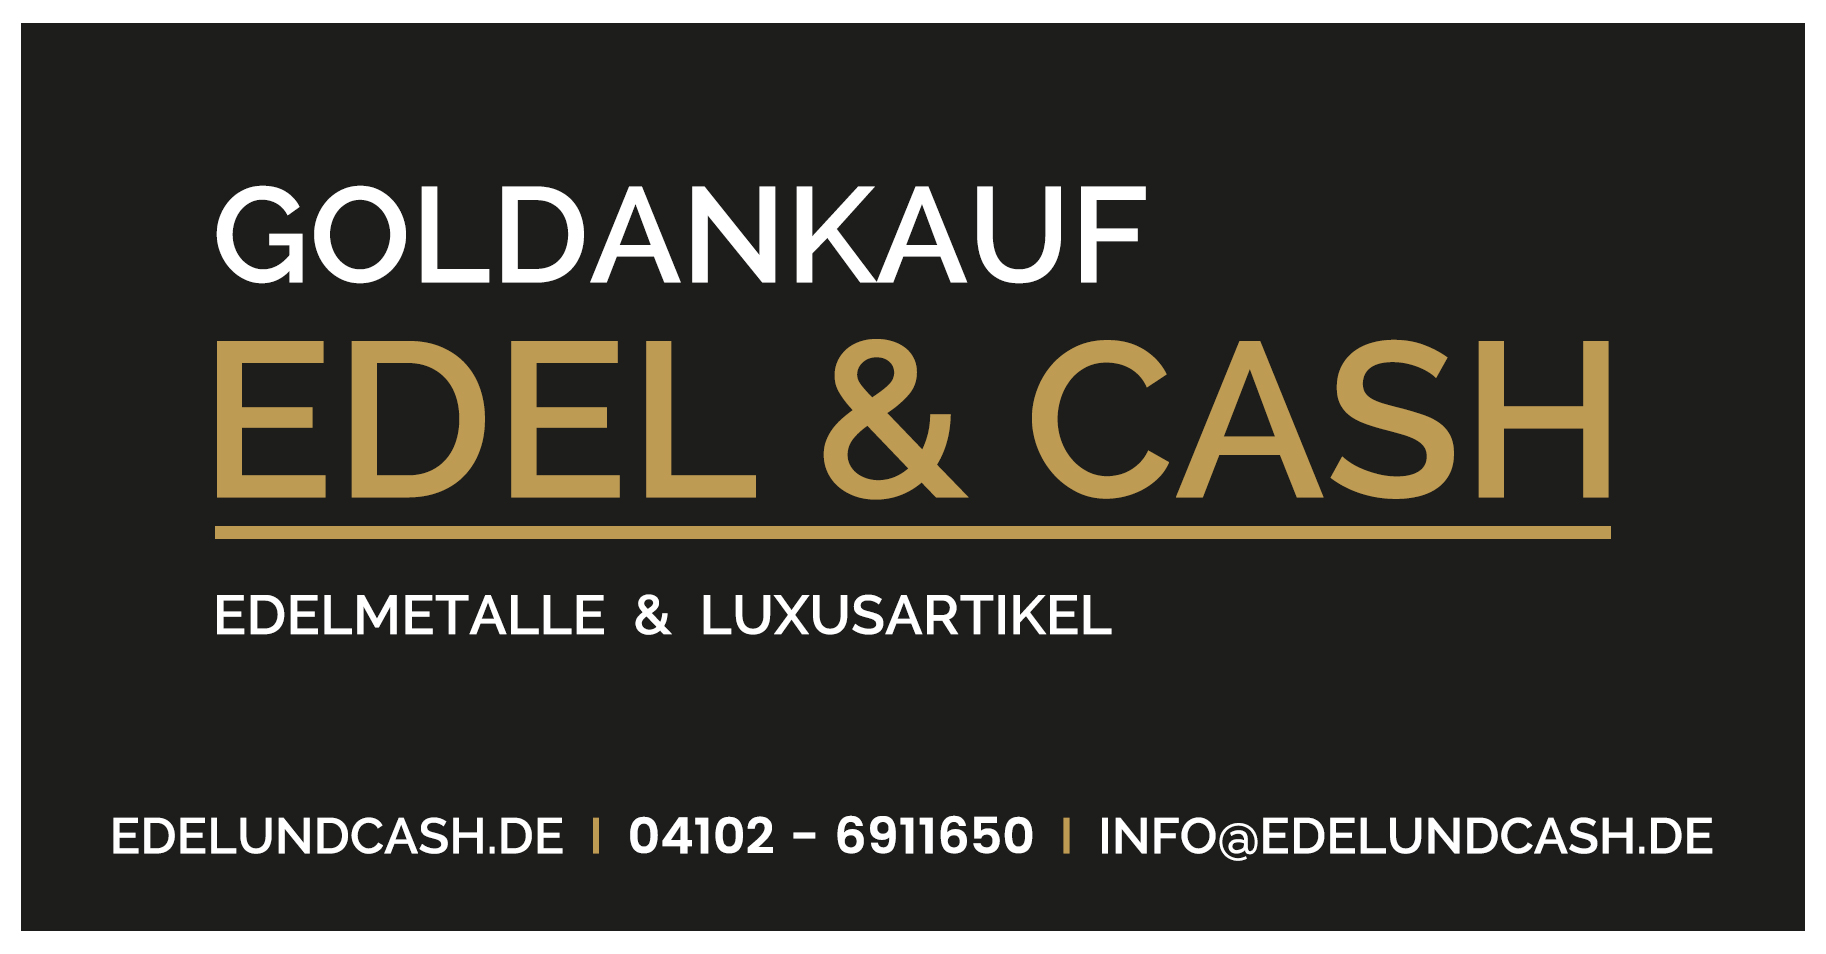 Goldankauf Edel & Cash Logo